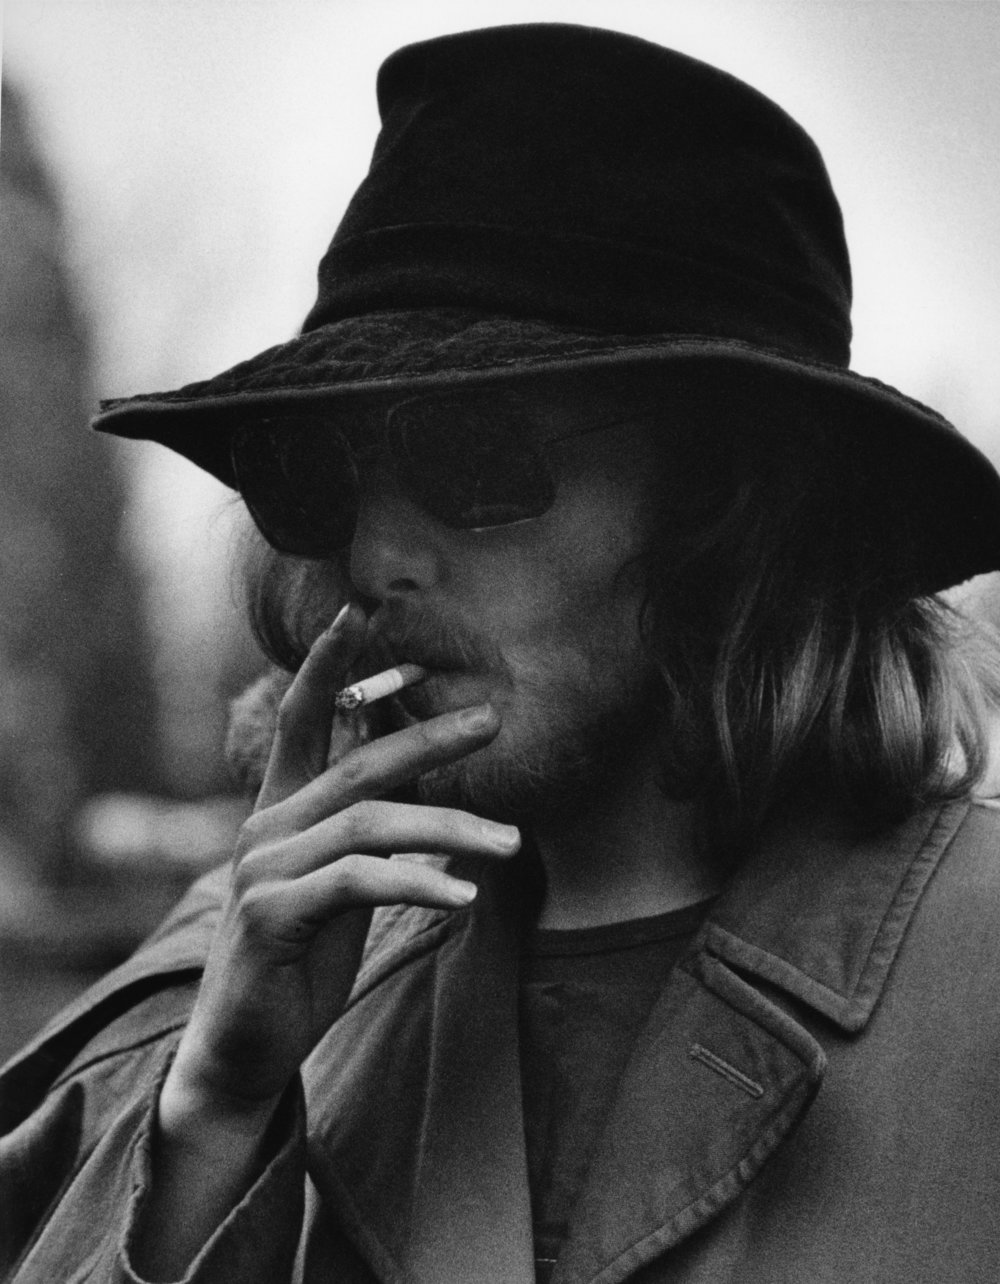 Smoking, Manchester